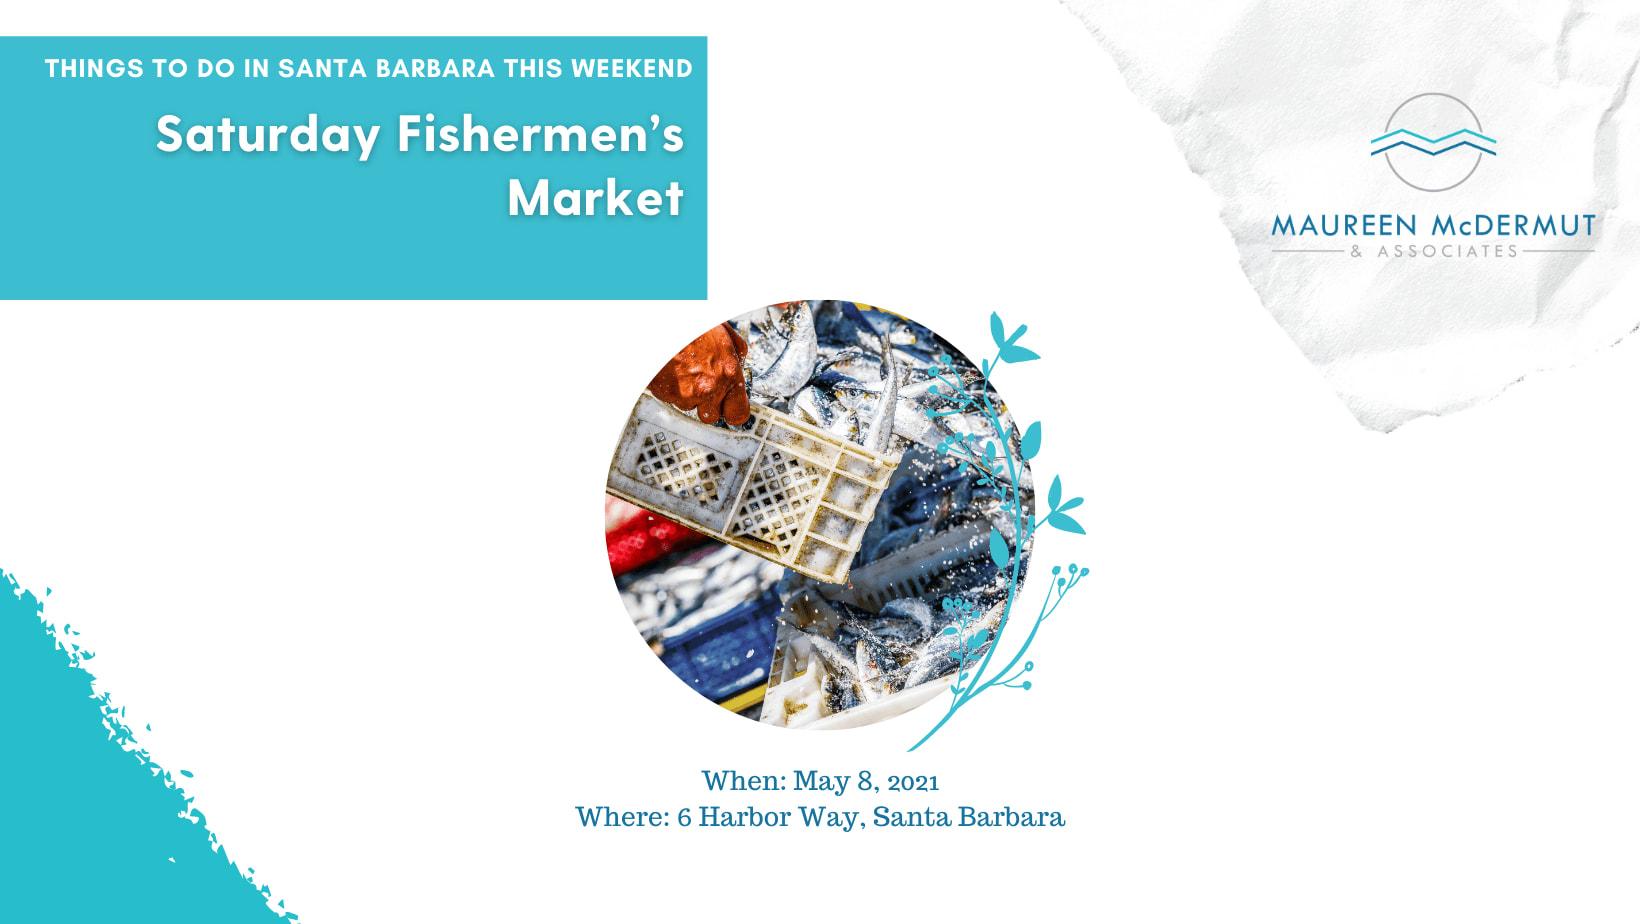 Saturday Fishermen's Market image